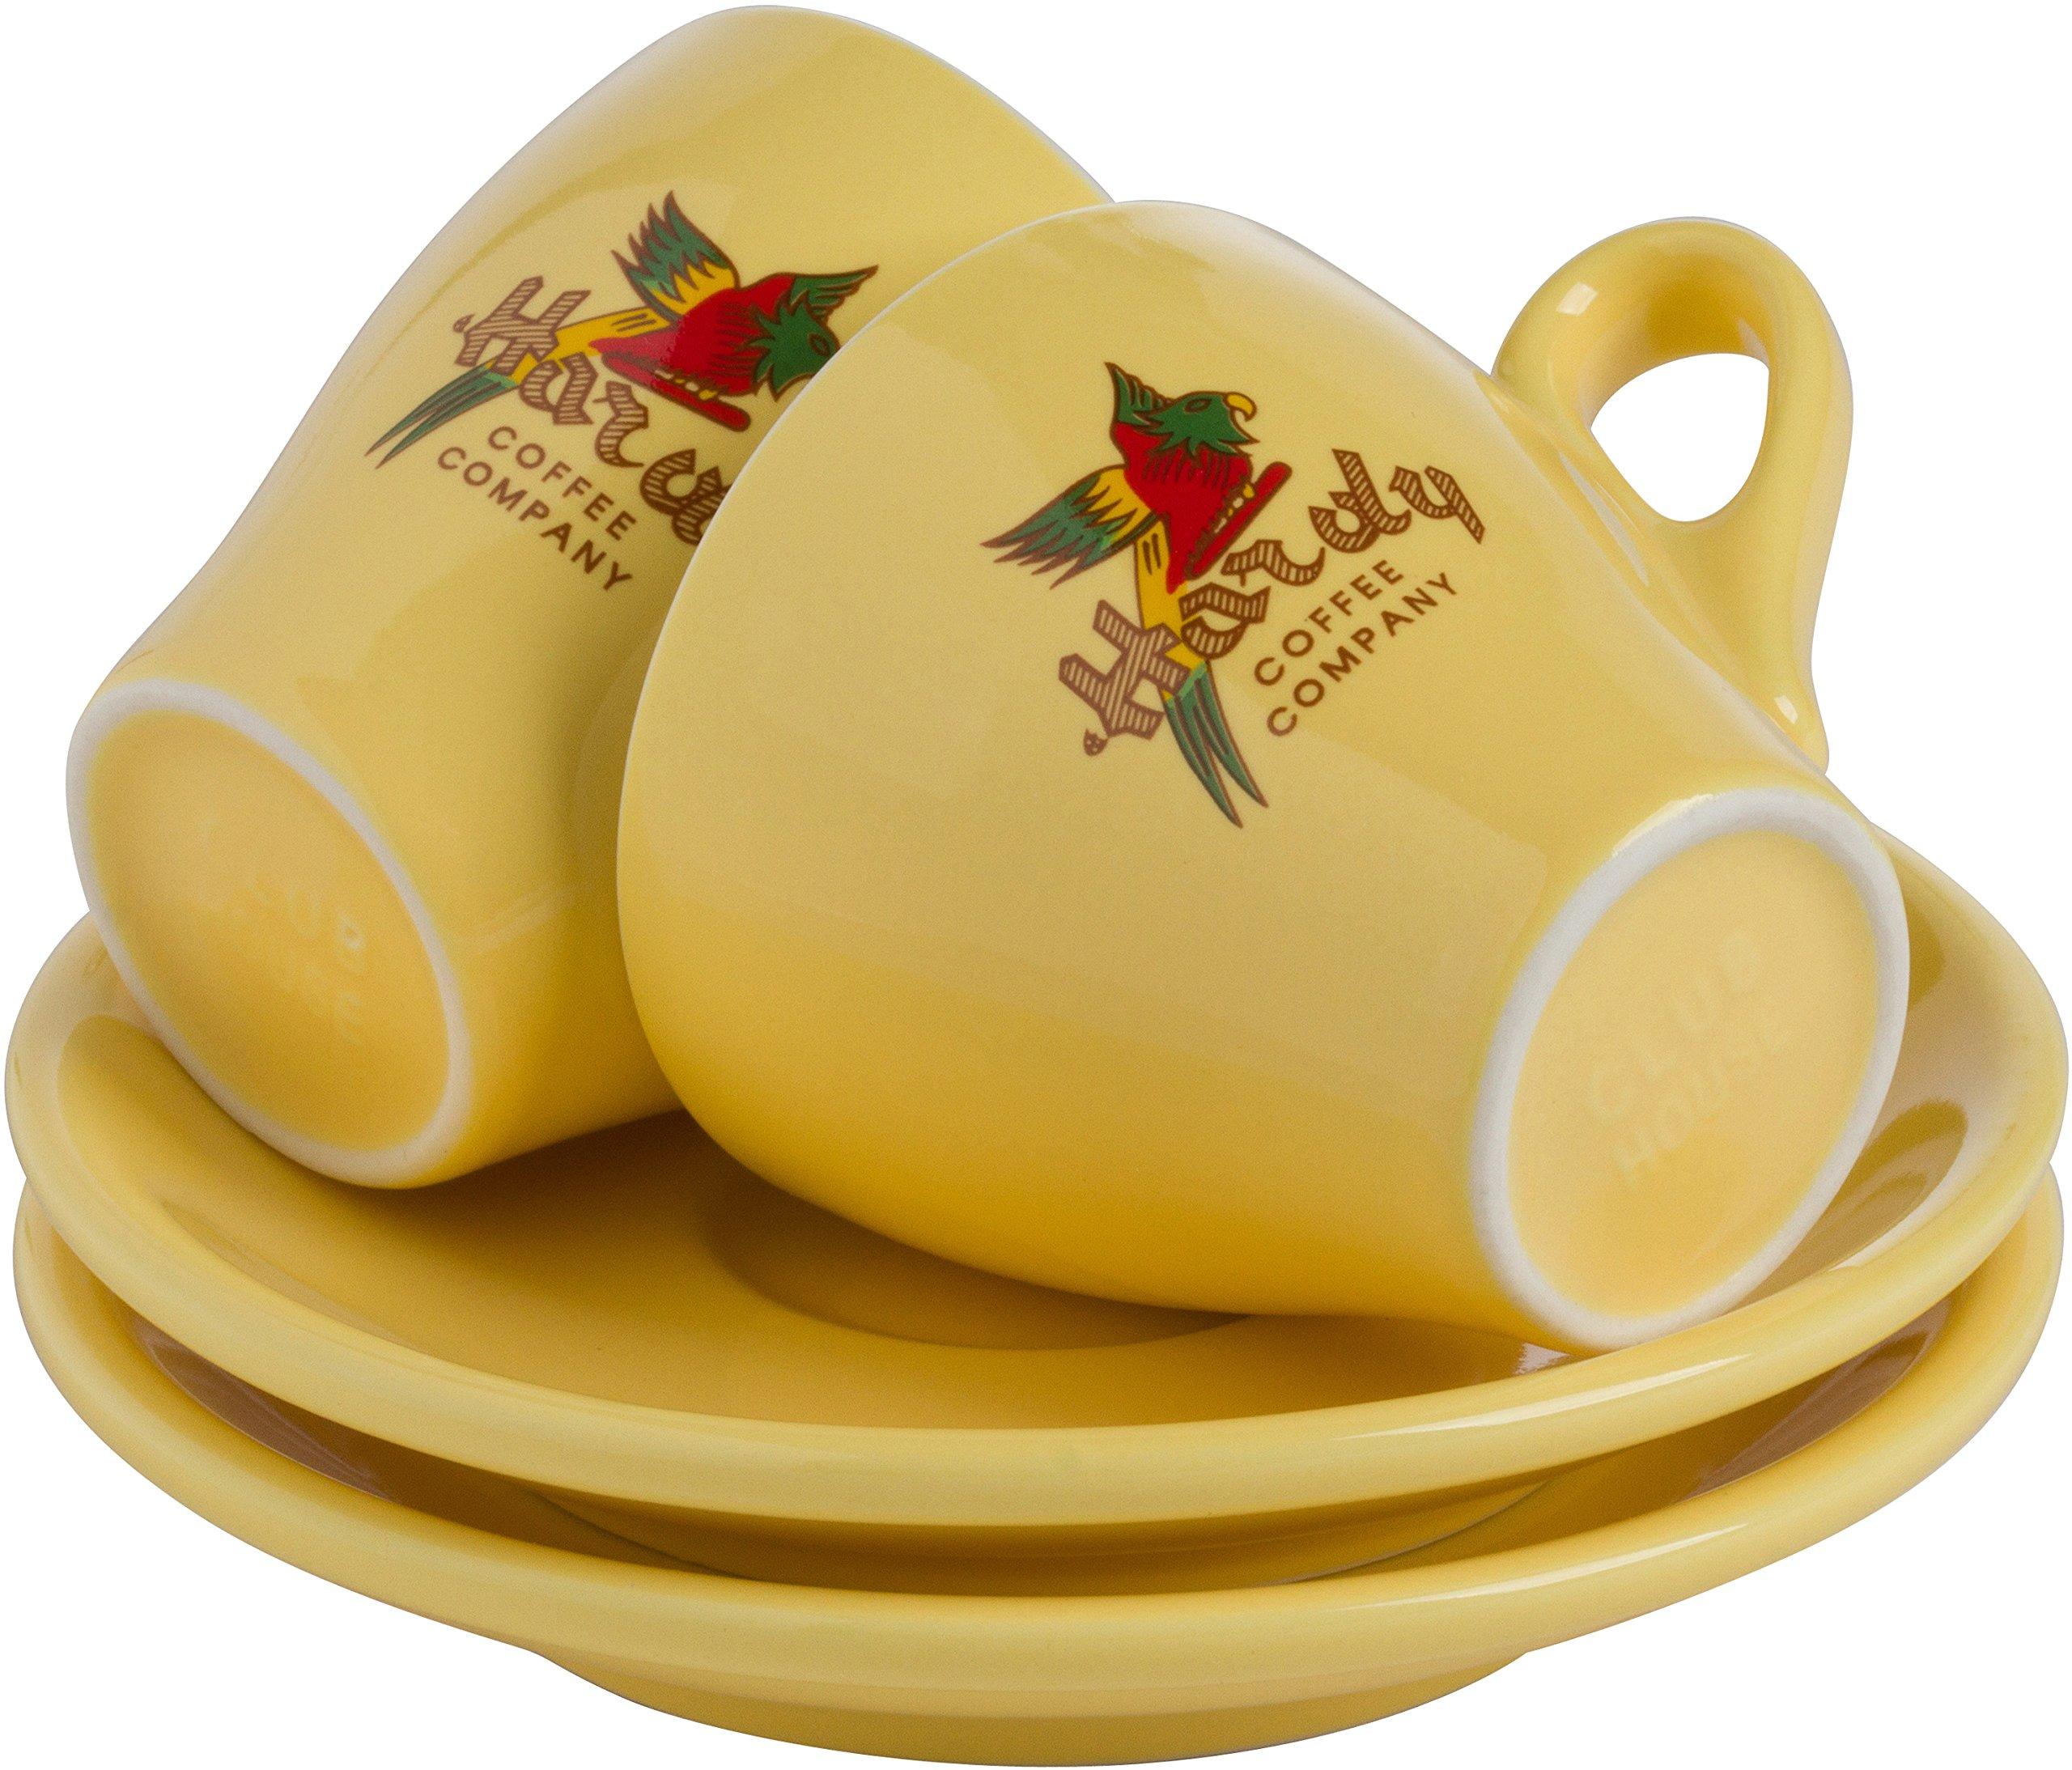 6 Retro Italian Espresso Cups with Saucers from Hardy Caffé, Milano (Yellow, Espresso)